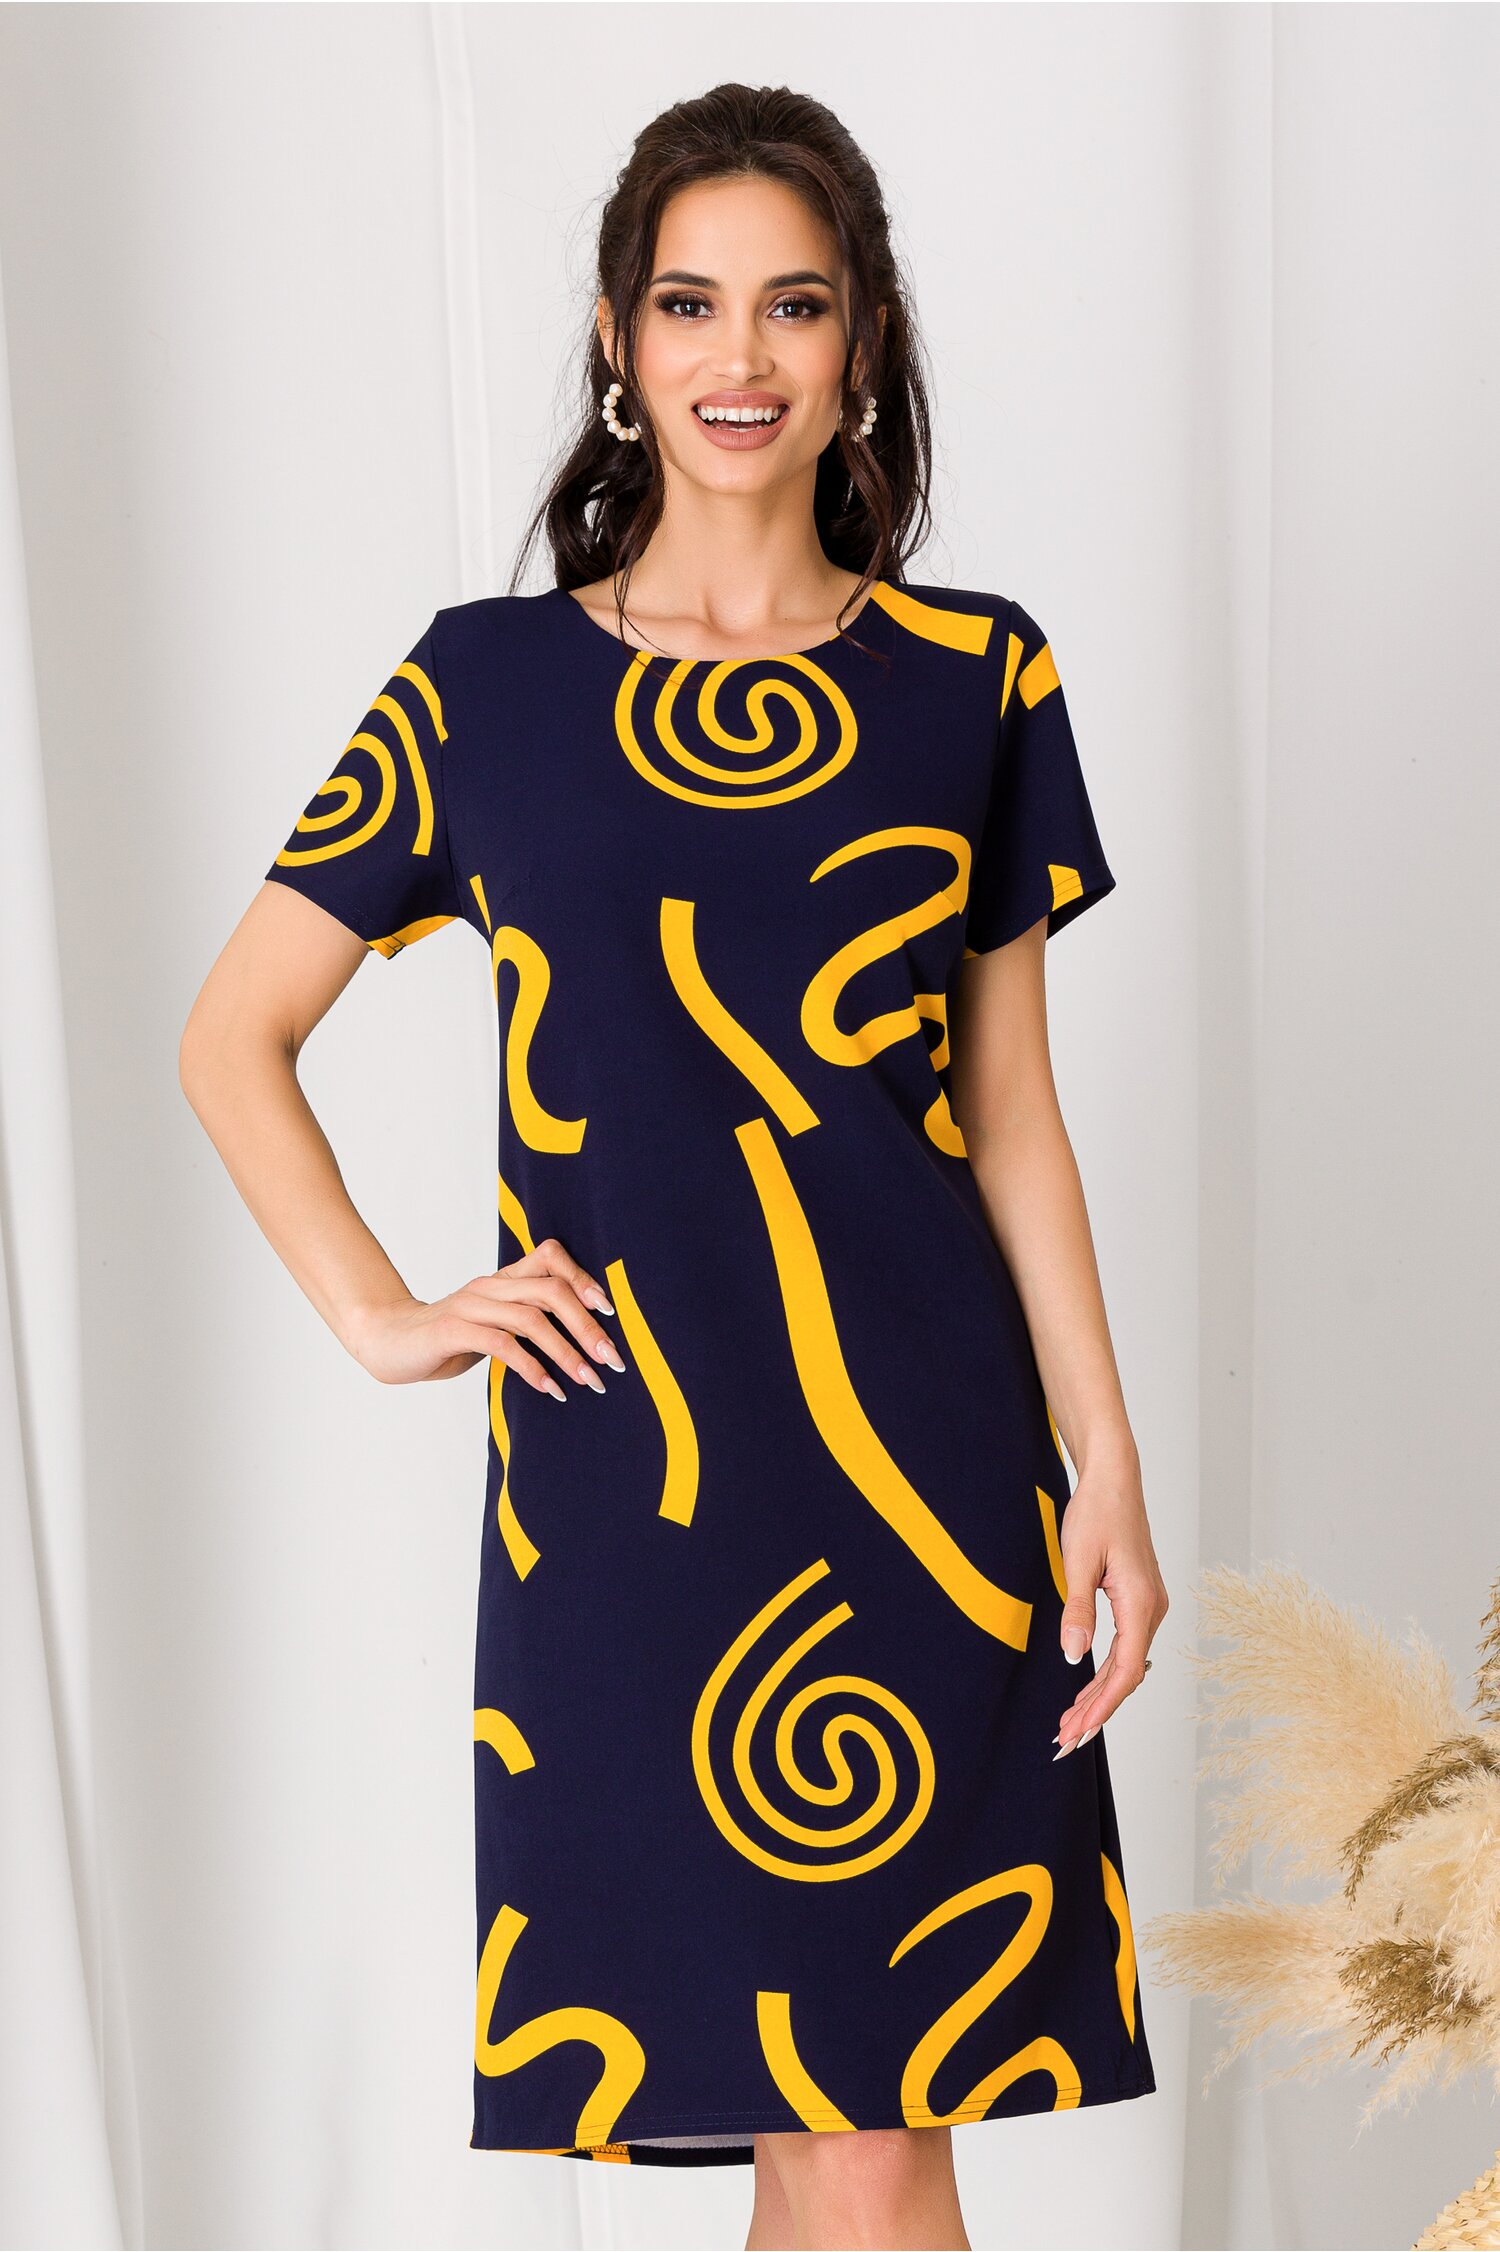 Rochie Simona bleumarin cu imprimeu galben imagine dyfashion.ro 2021